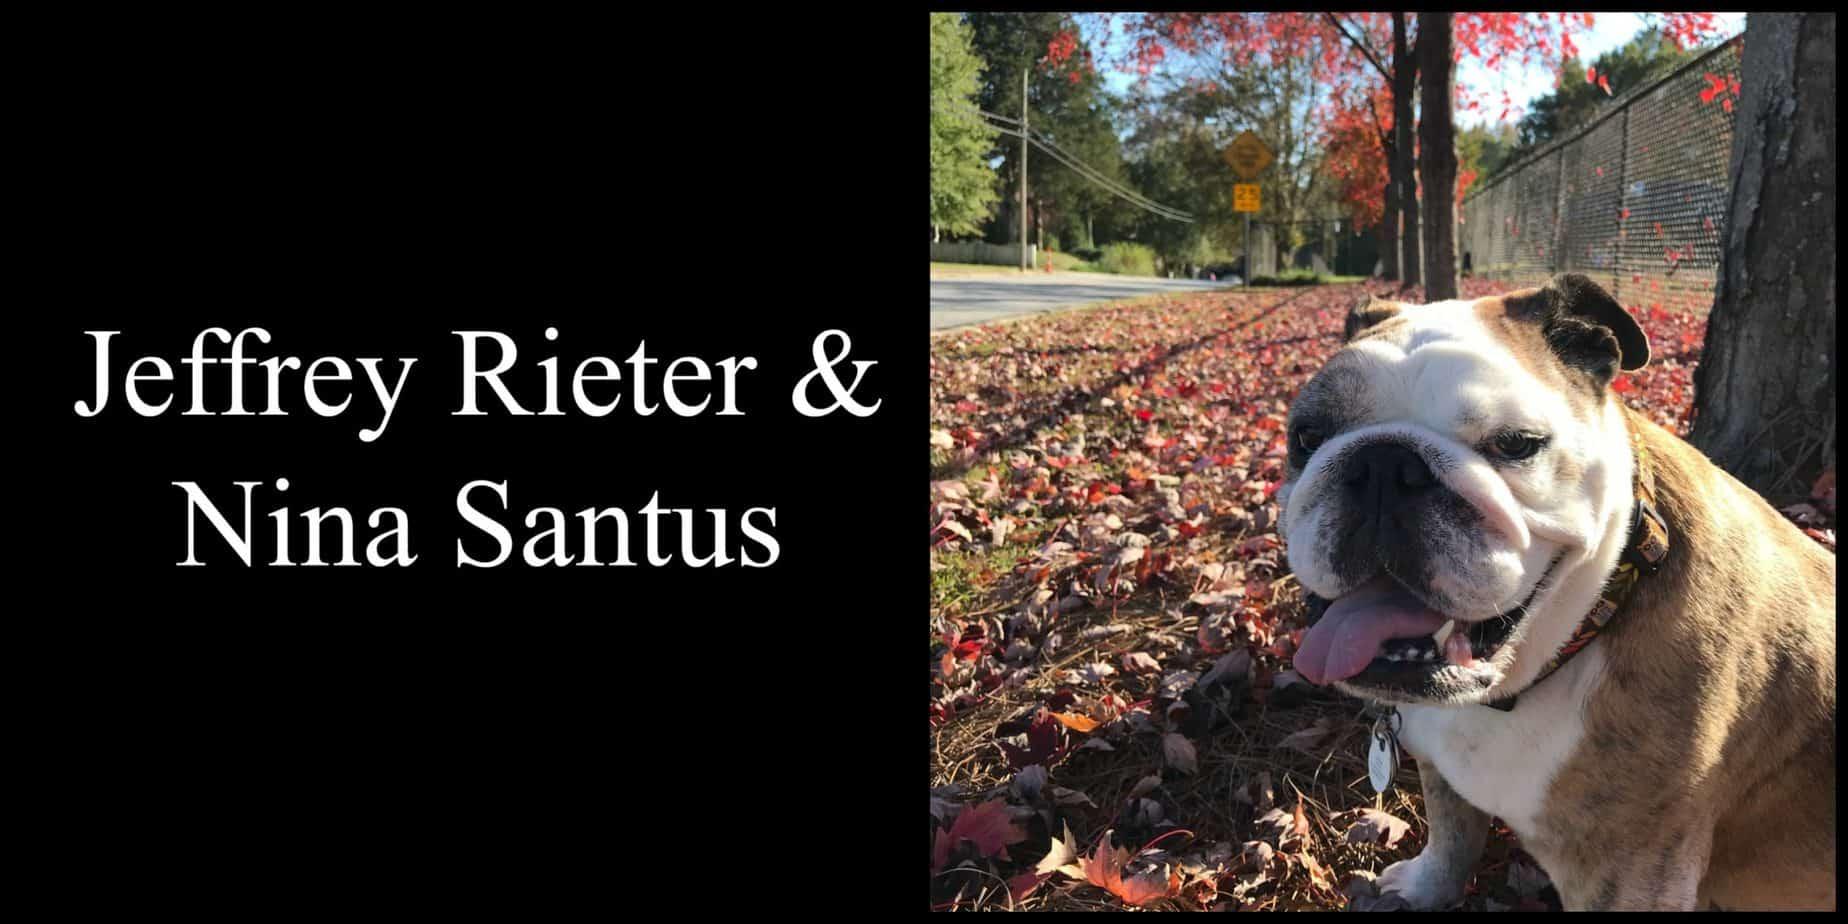 4,000 - RIETER AND SANTUS